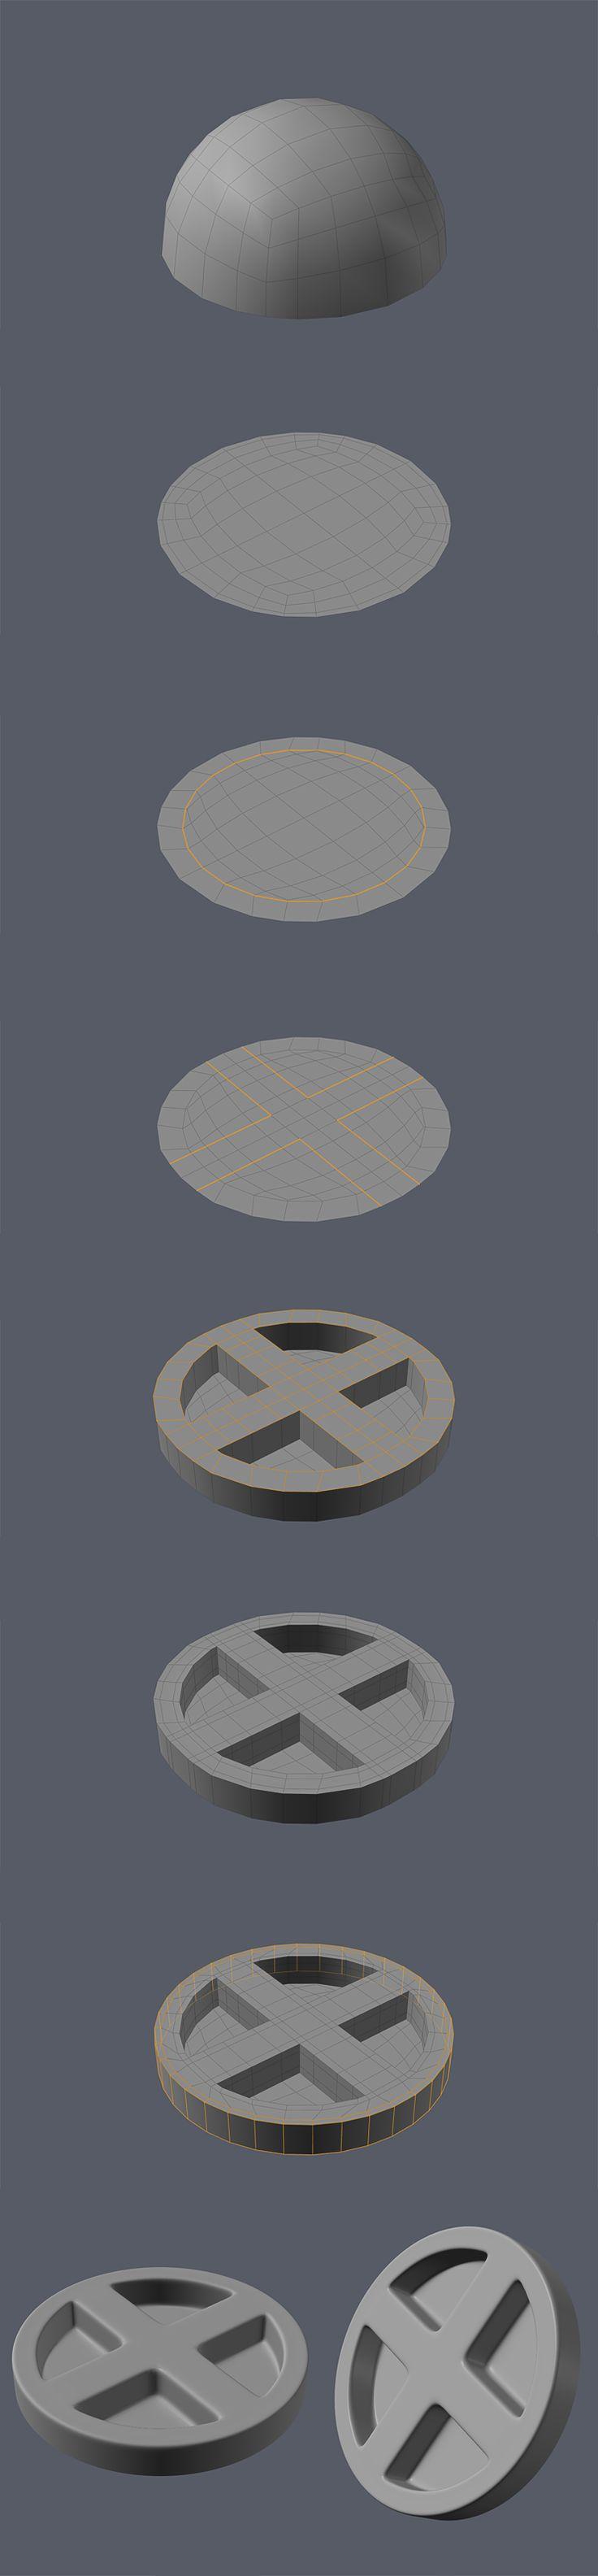 FAQ: How u model dem shapes? Hands-on mini-tuts for mechanical sub-d AKA ADD MORE GEO - Page 189 - Polycount Forum